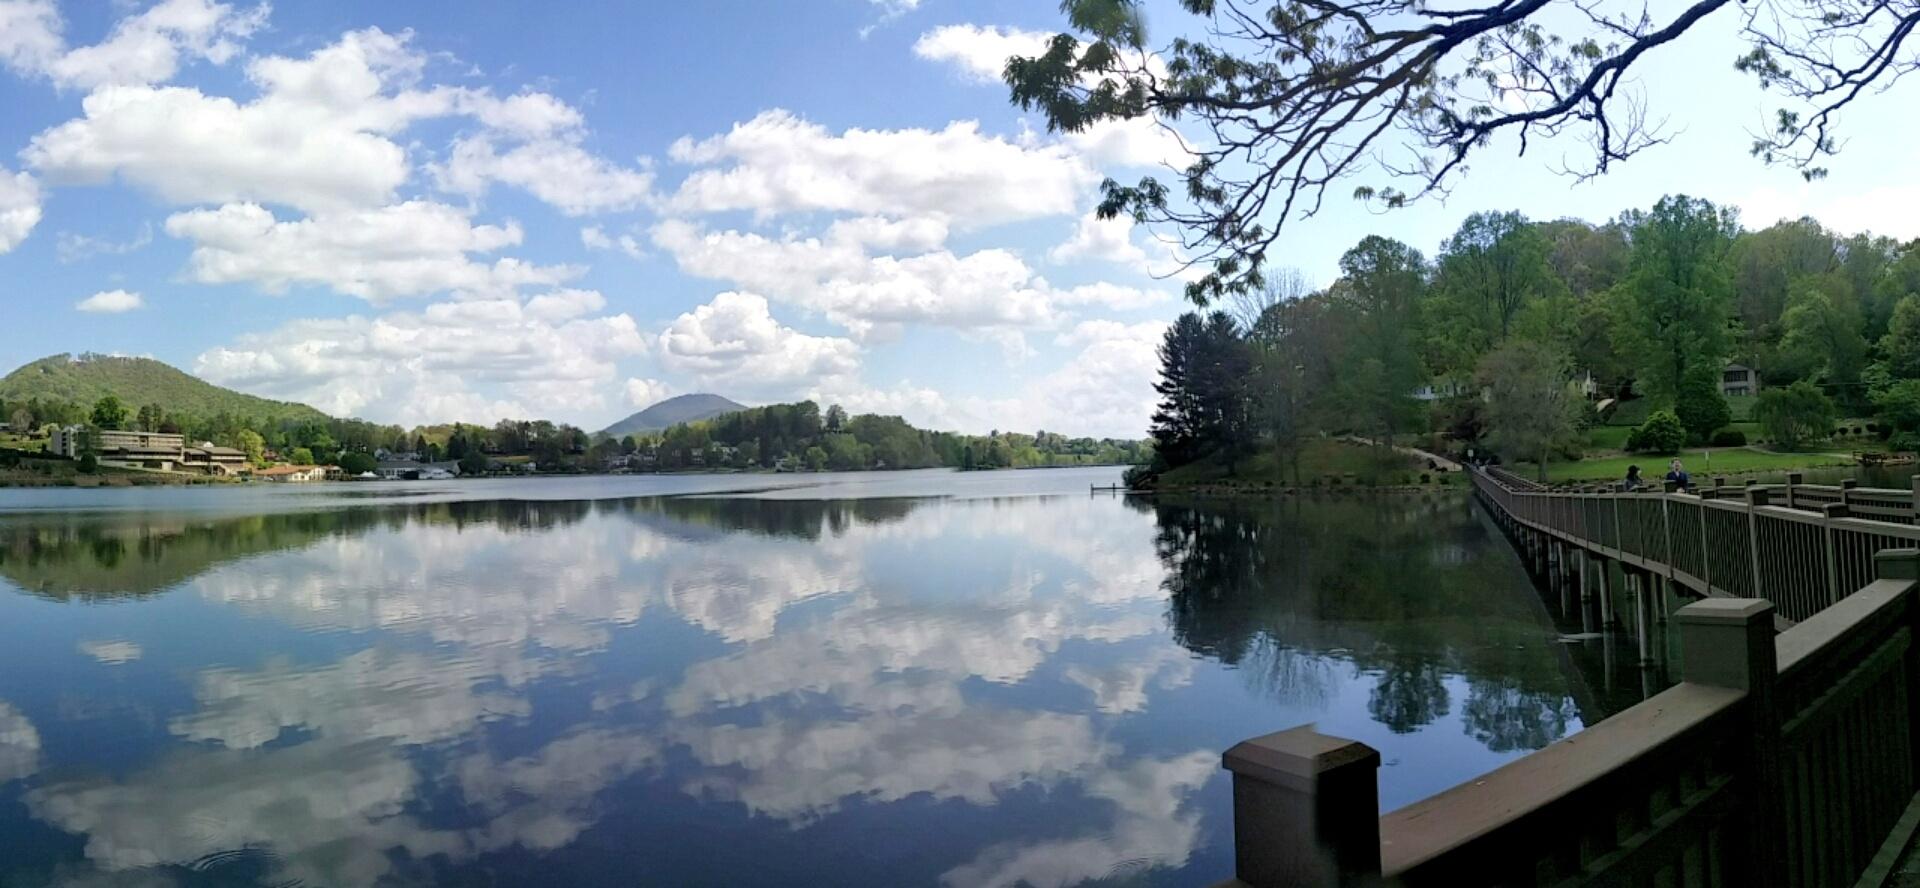 Lake Junaluska North Carolina by keith.kinsland